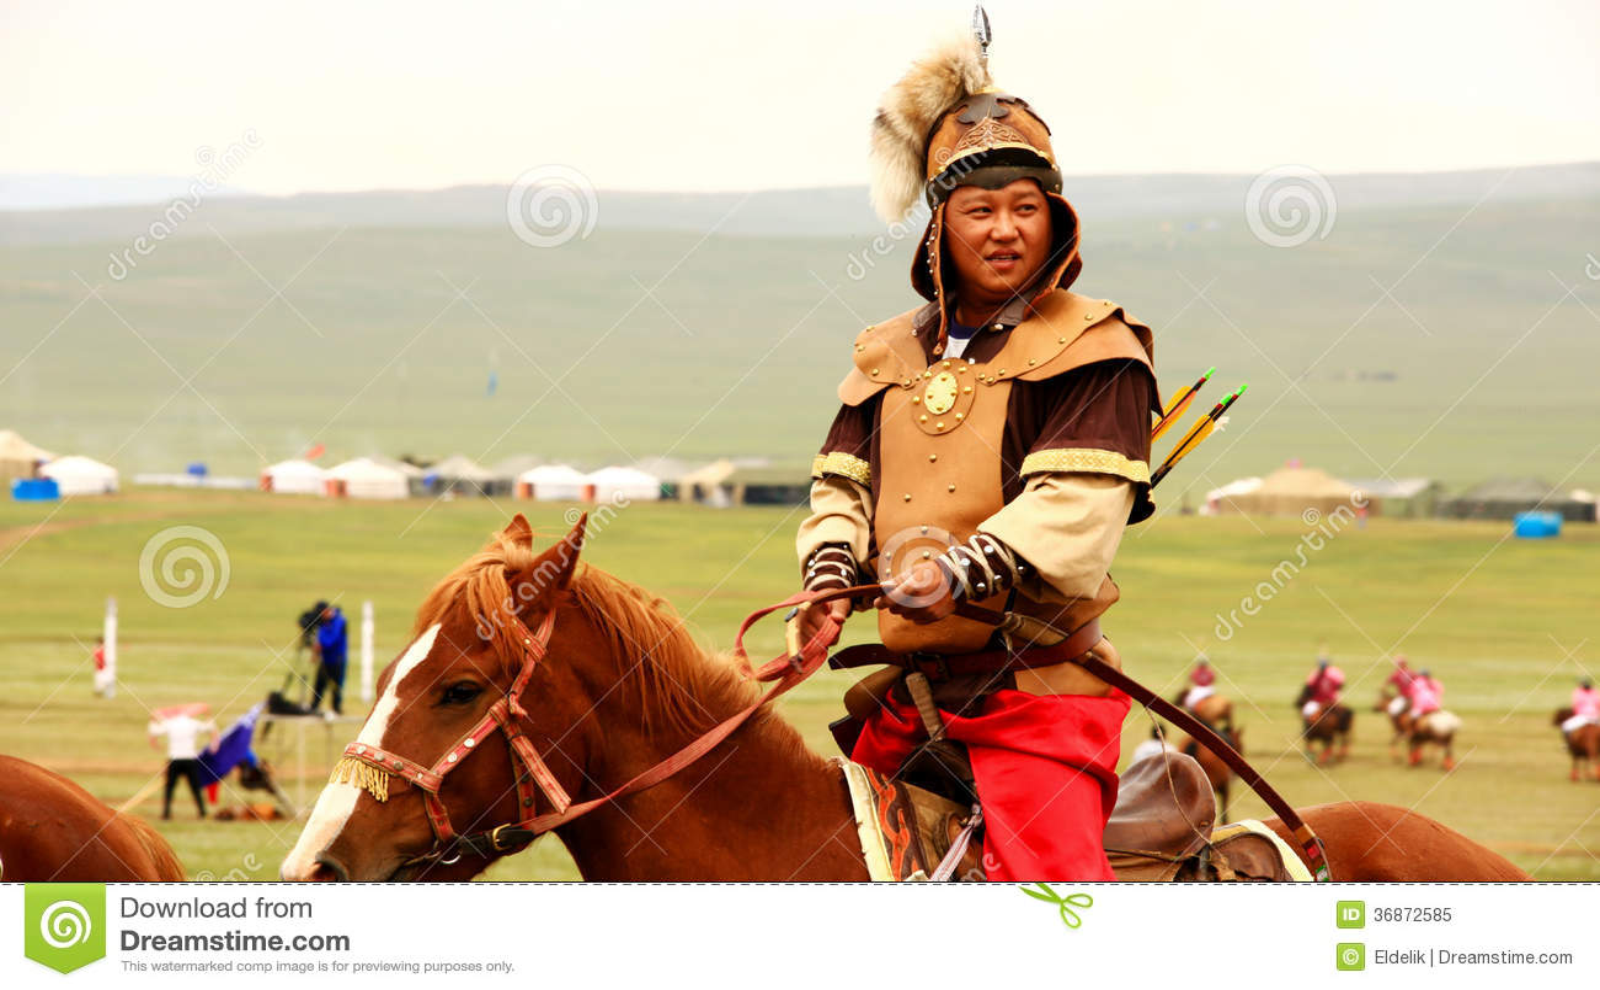 ULAANBAATAR, MONGOLIA - JULY 2013: Naadam Festival Horse Archery Crew